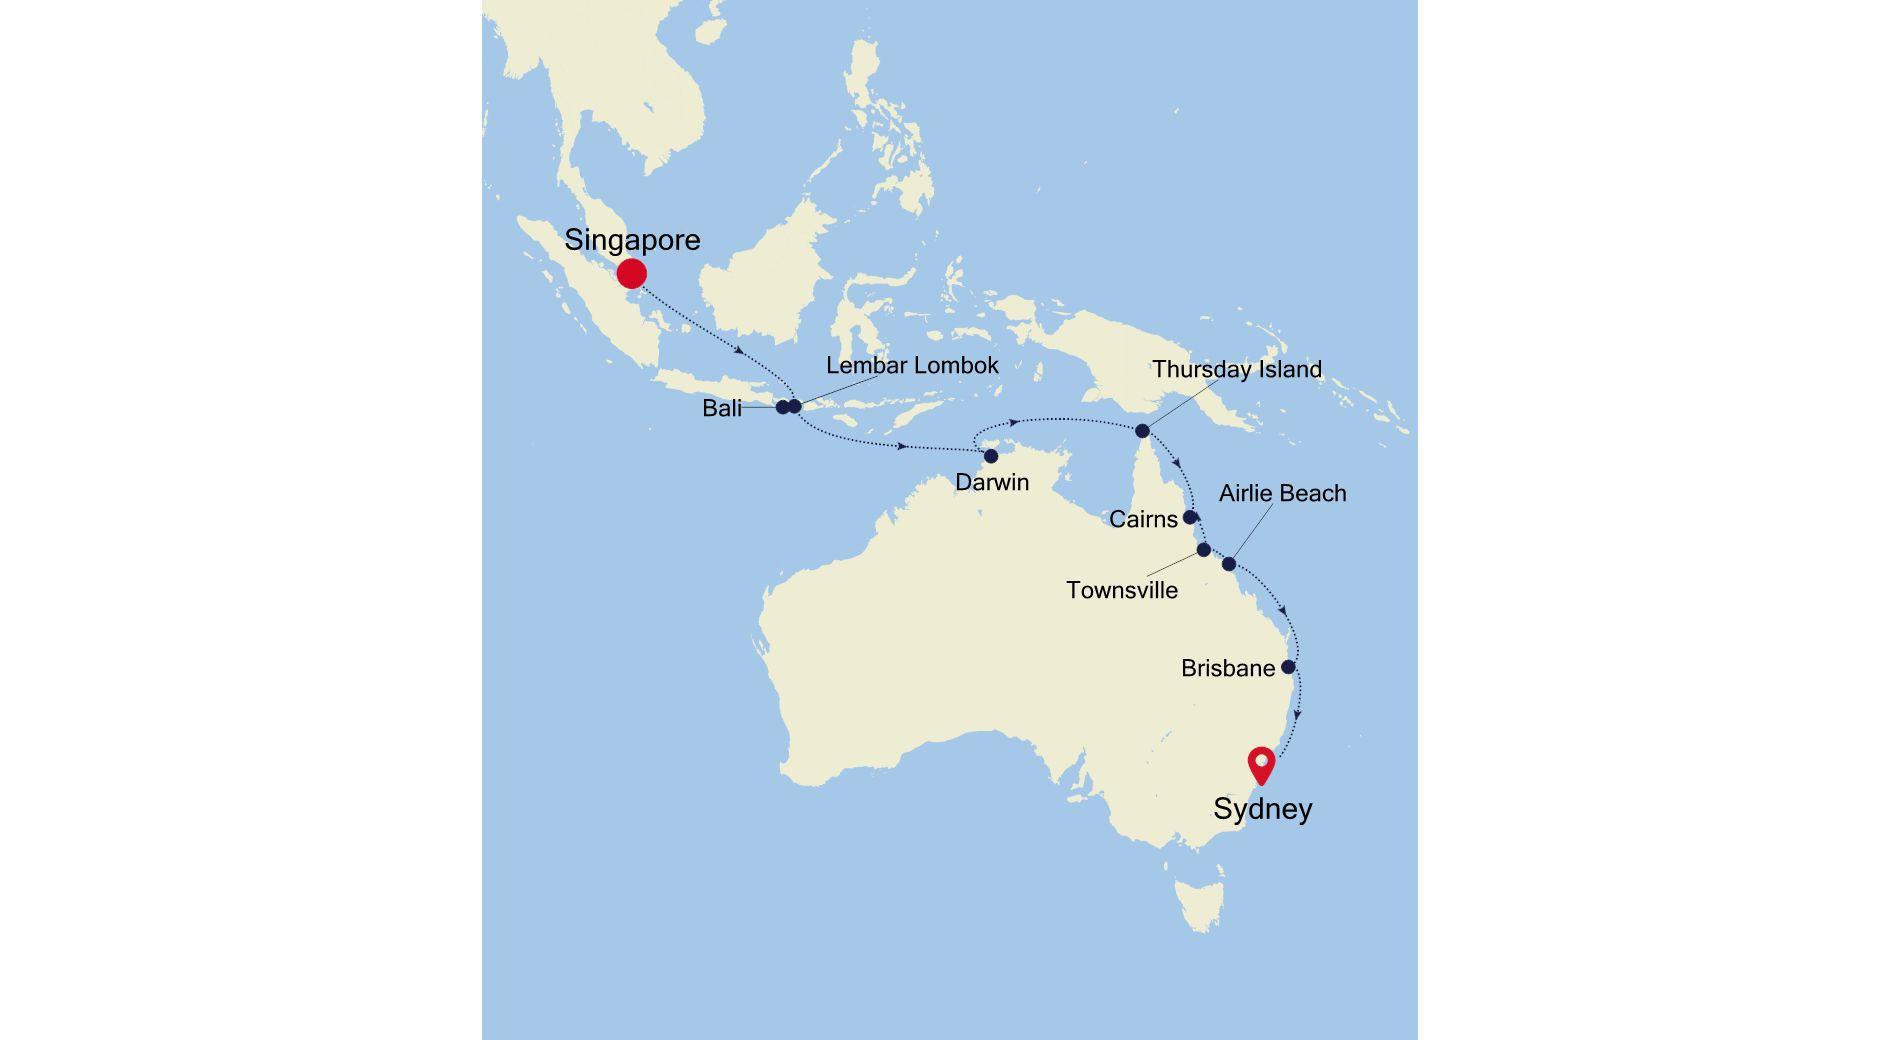 SM211129018 - Singapore à Sydney